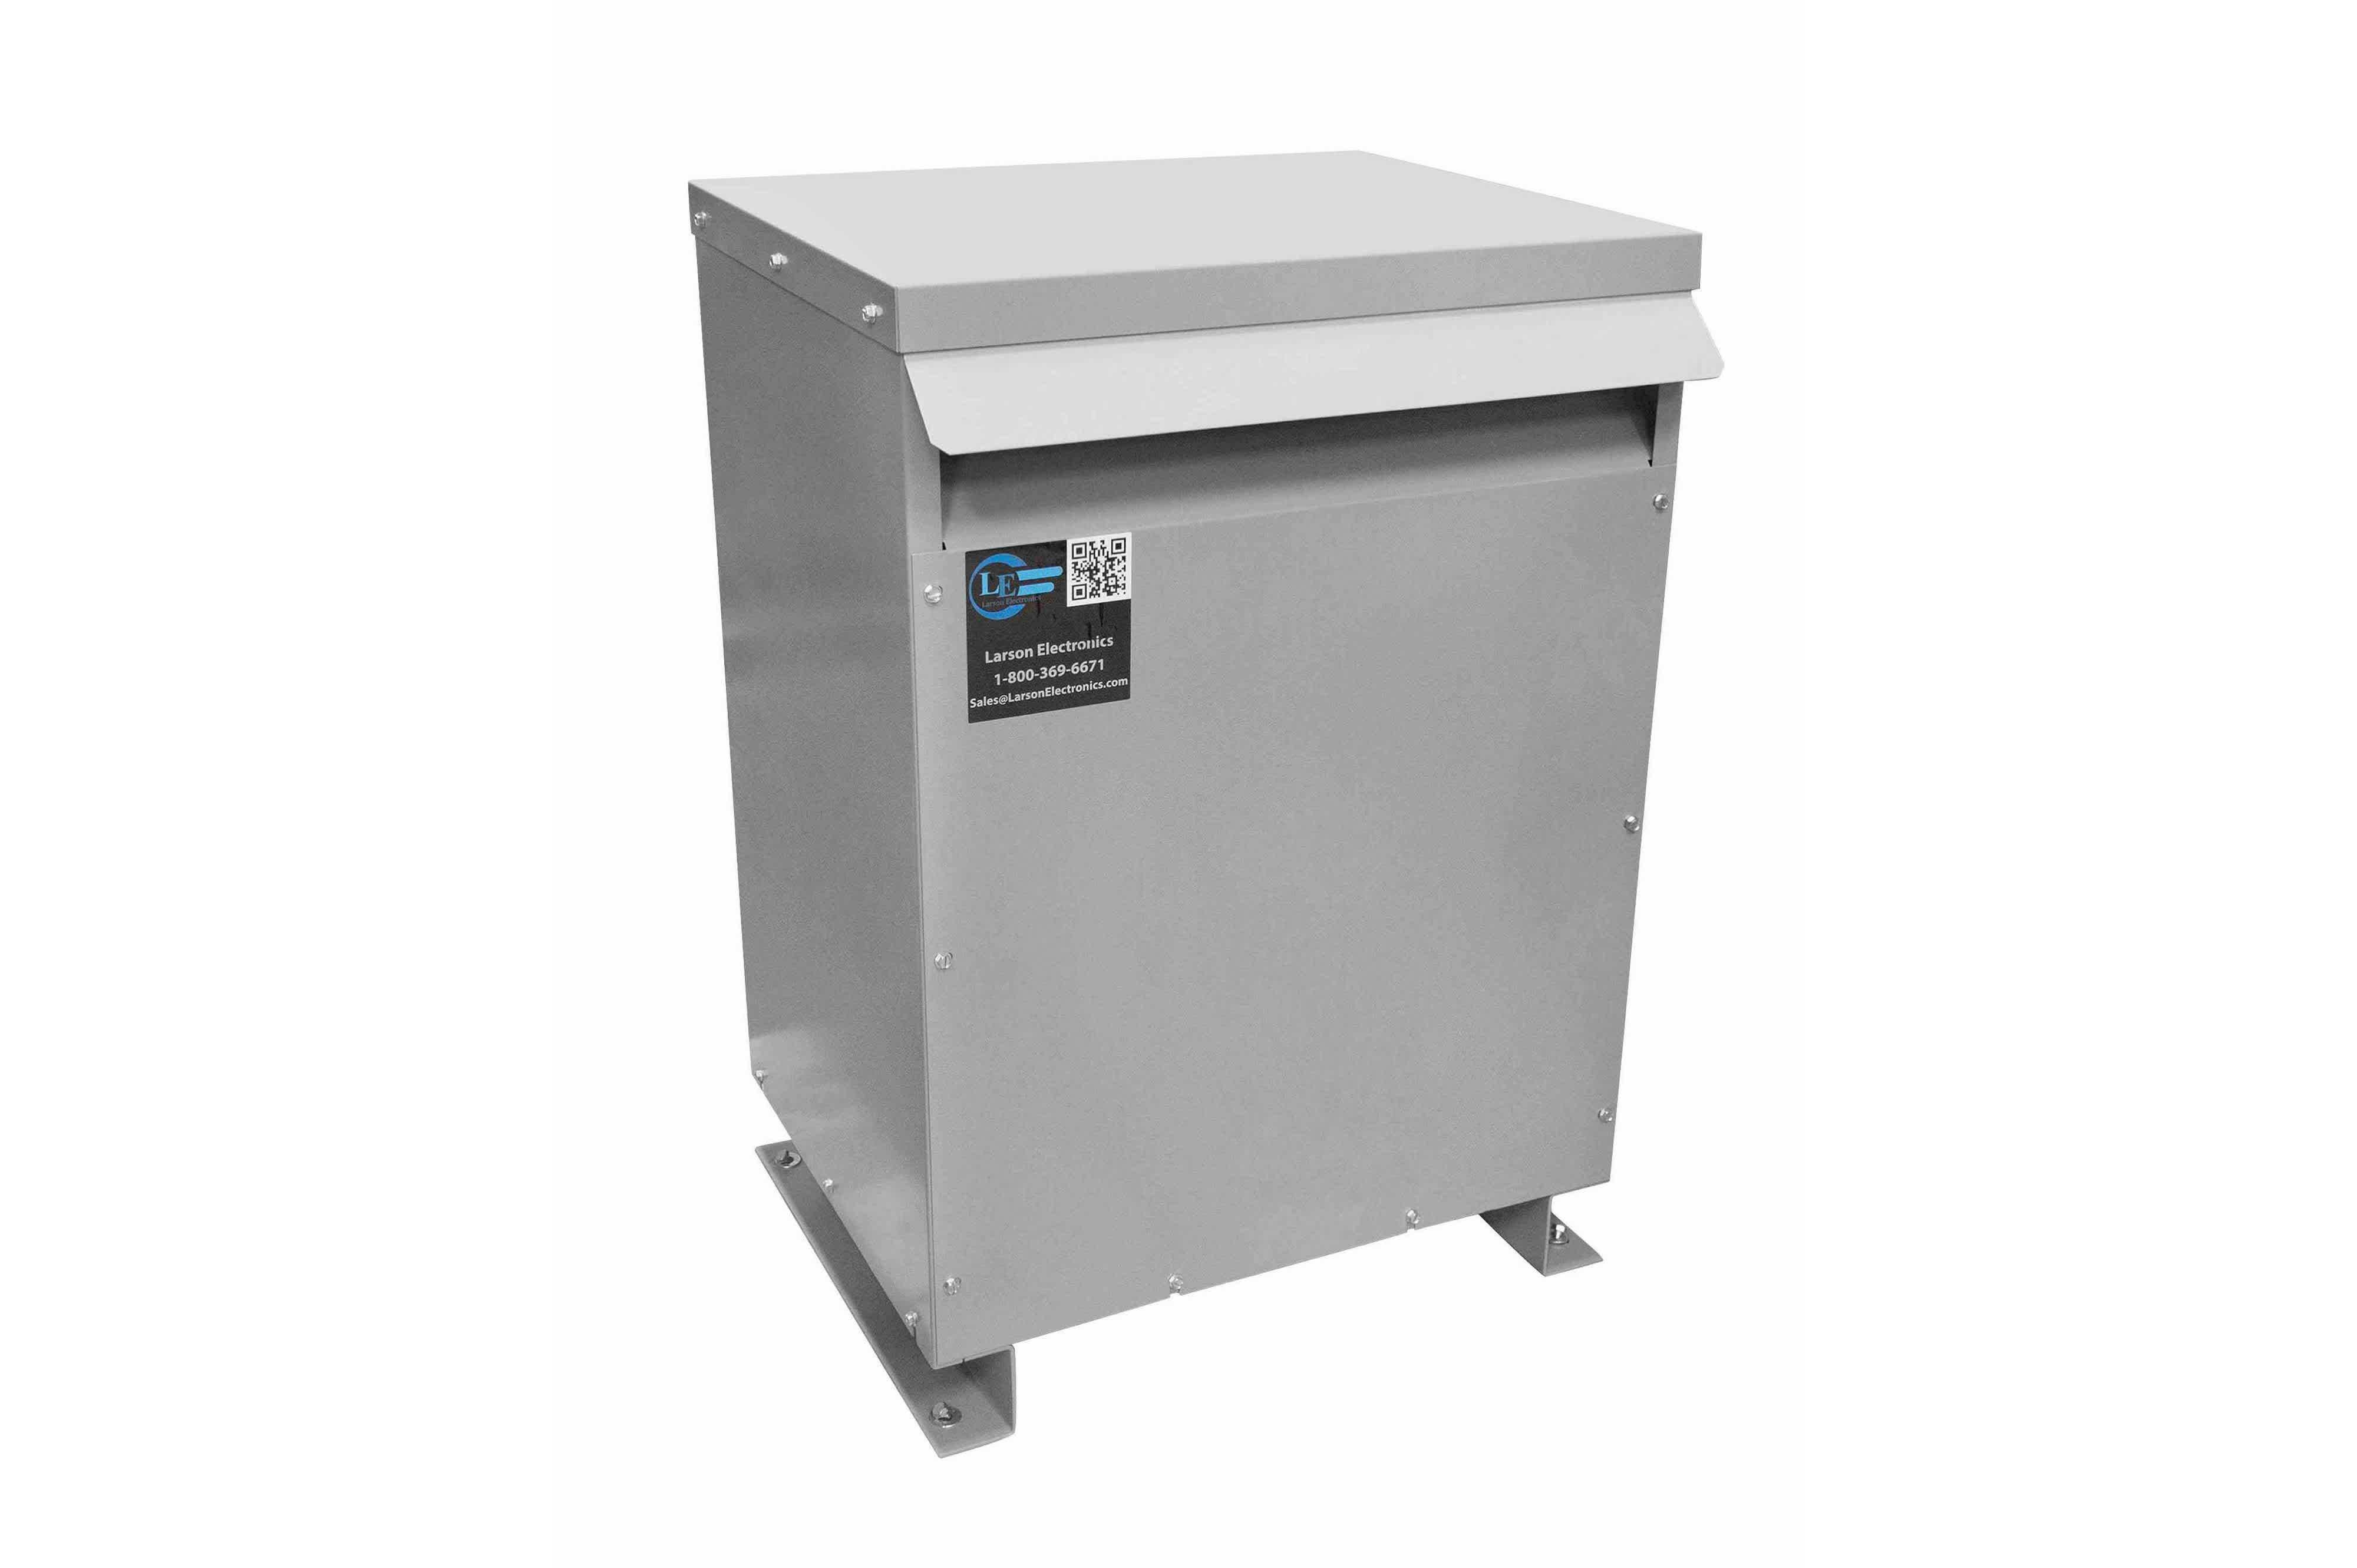 65 kVA 3PH Isolation Transformer, 240V Wye Primary, 208Y/120 Wye-N Secondary, N3R, Ventilated, 60 Hz